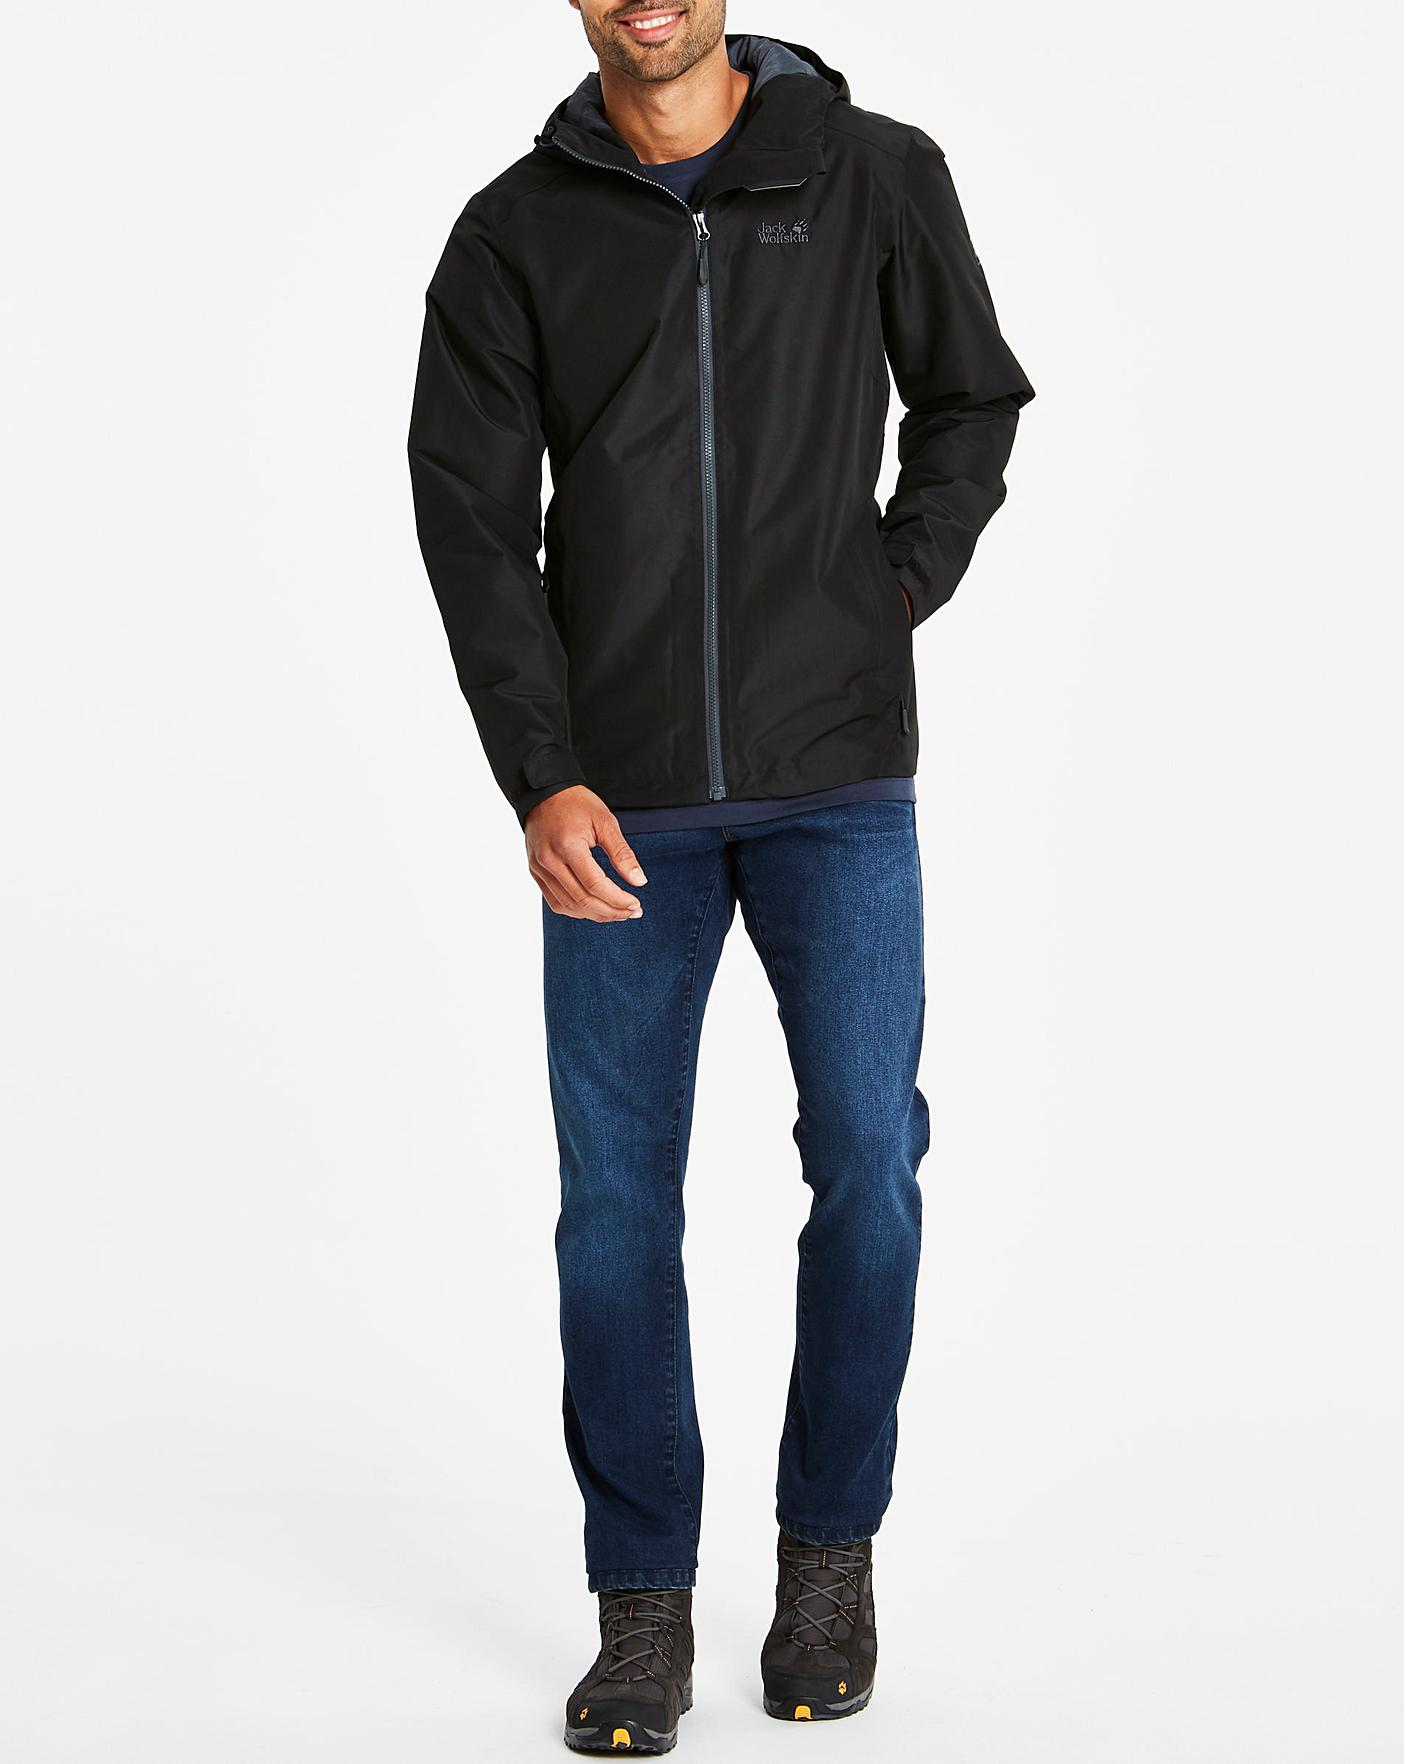 jack wolfskin chilly morning jacket